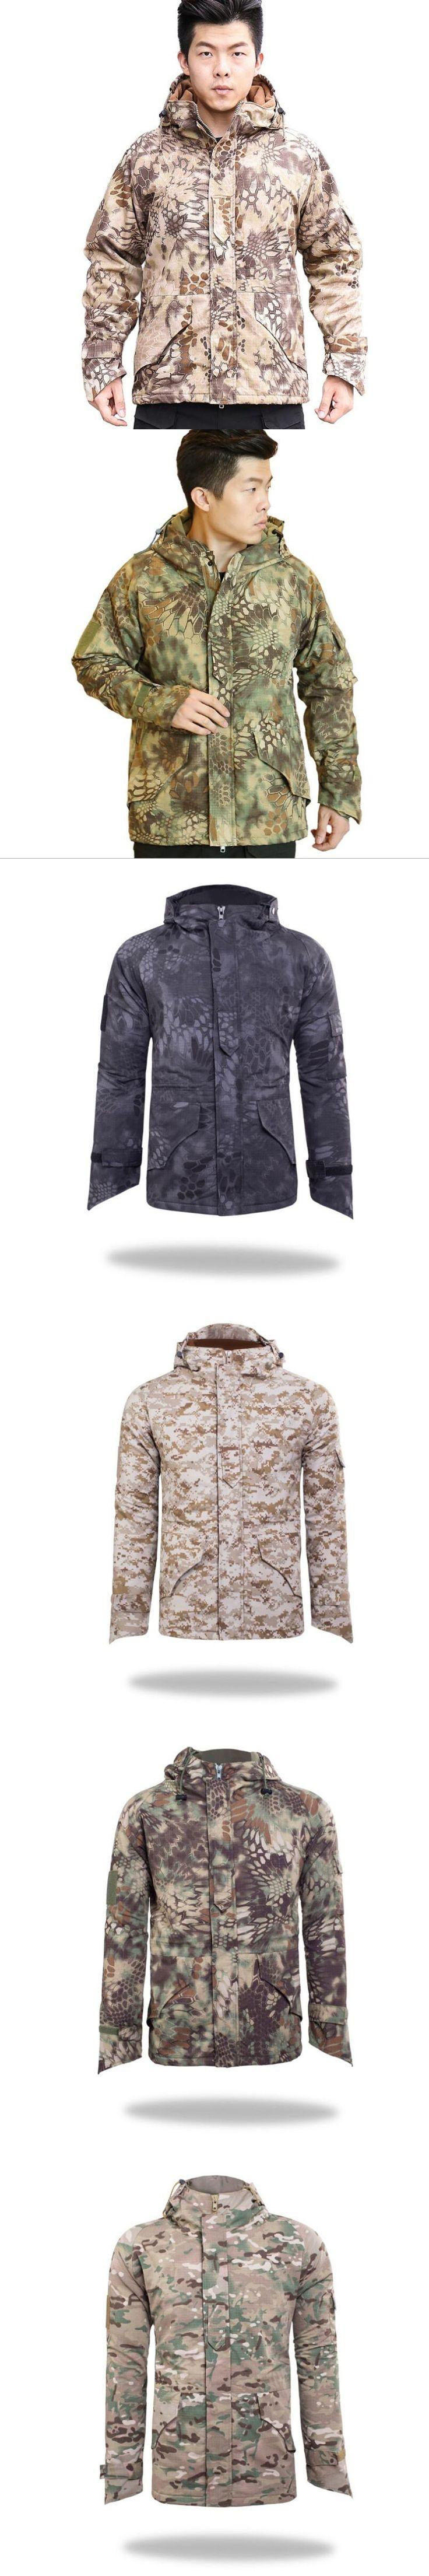 Python Softshell Jacket Men G8 Outdoors Military Tactical Jacket Men Waterproof Windproof Coat Hunt Camouflage Fleece Thickening